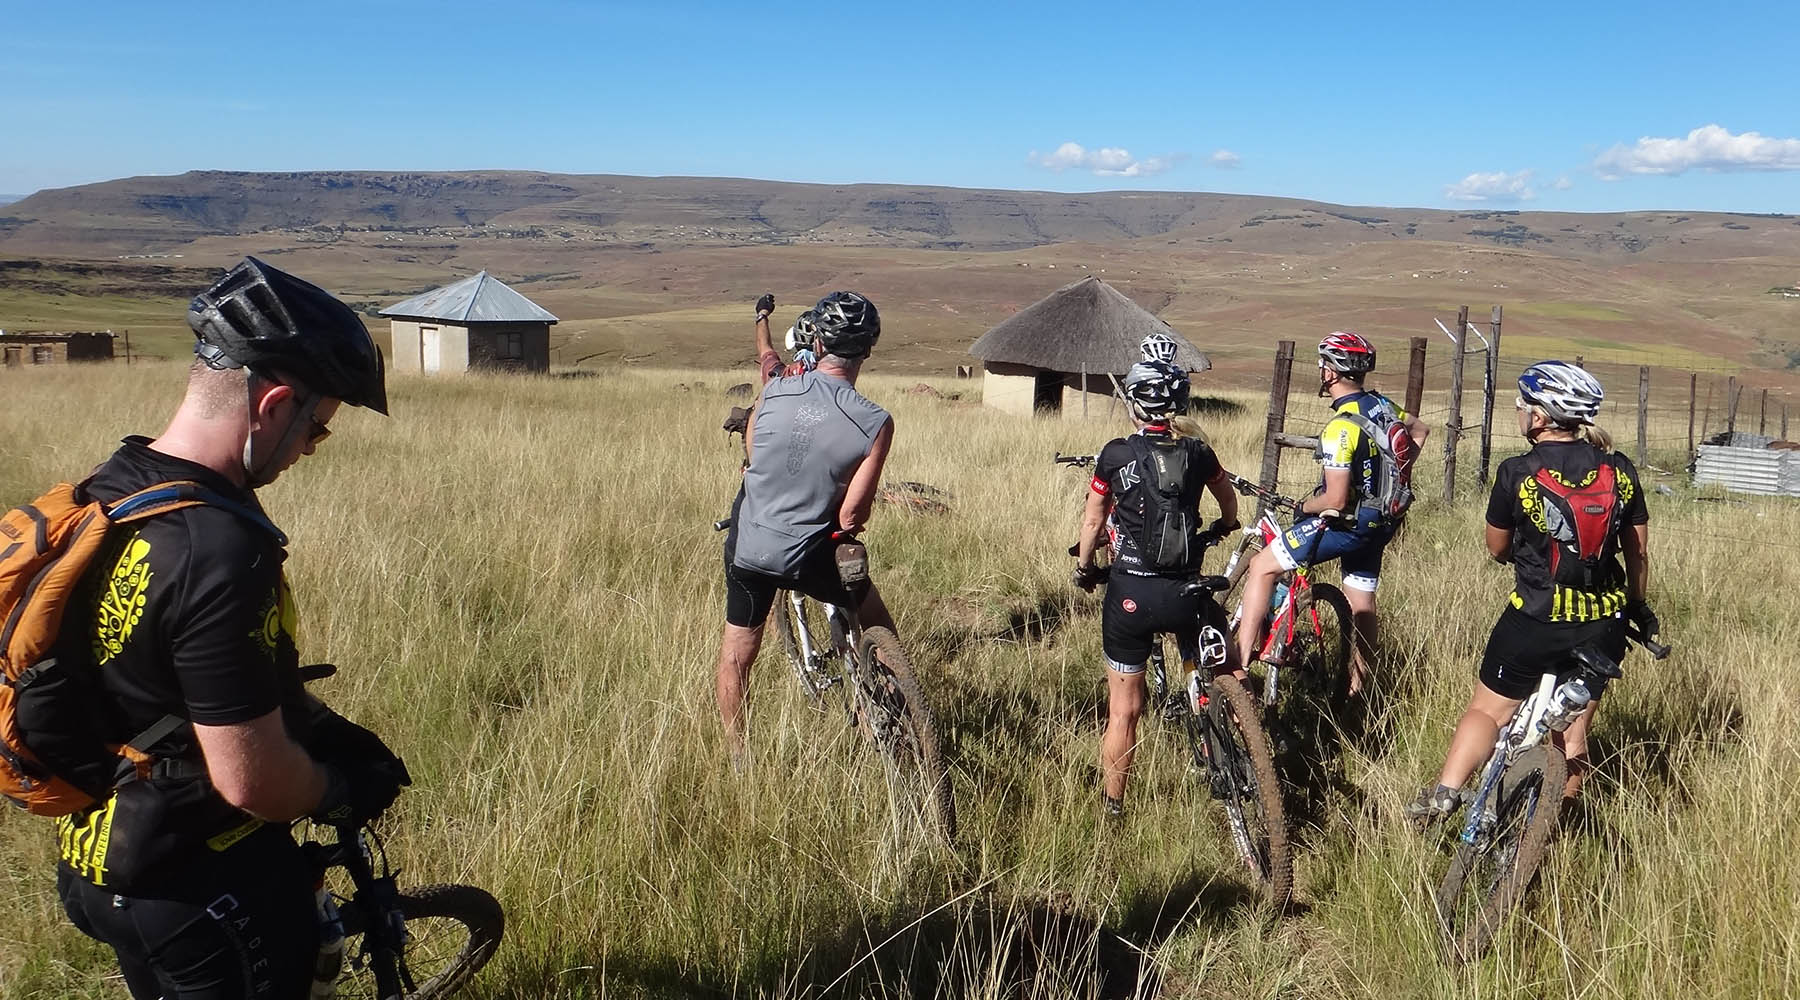 no mans land trail-riding-kwazulu-natal-detour-trails-adventure-mountain-bikes